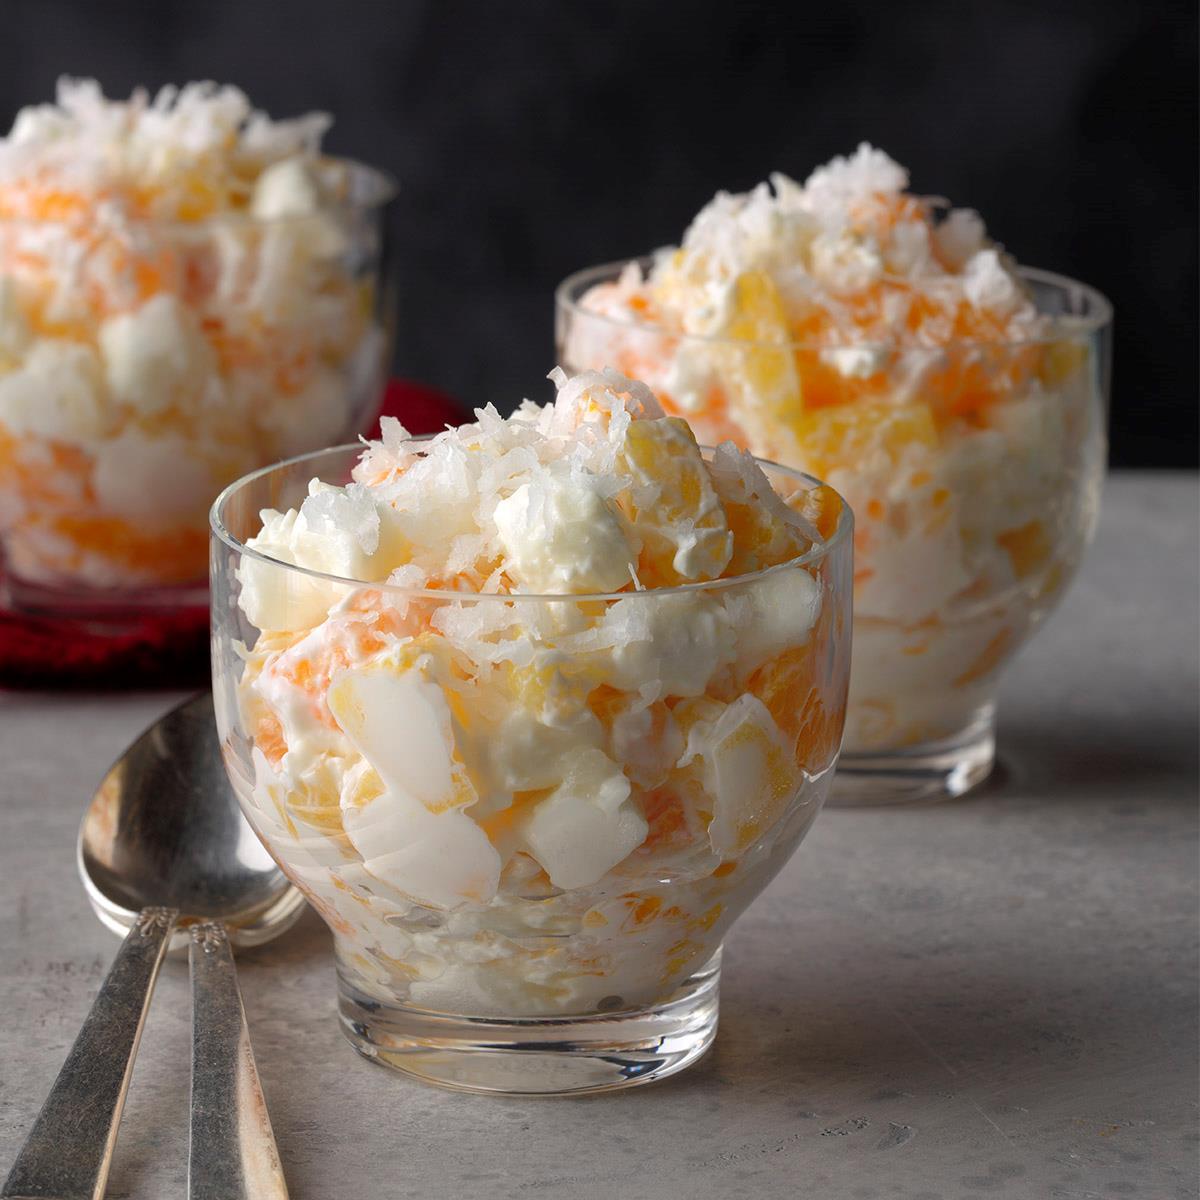 Ambrosia Salad Recipe With Sour Cream